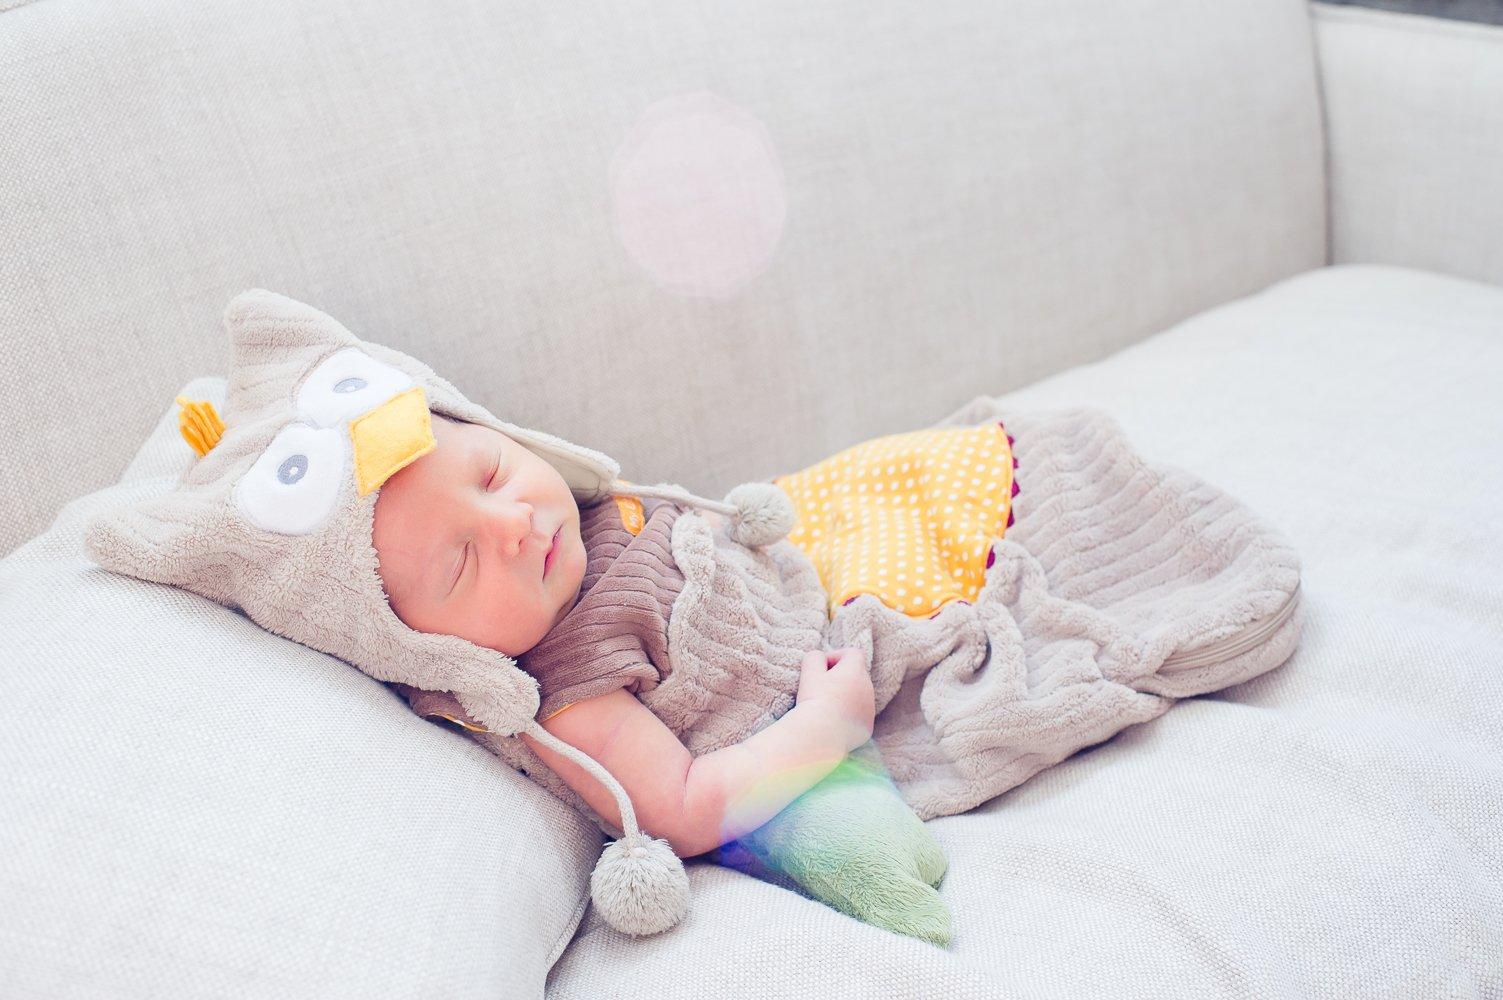 Chloe-Jackman-Photography-Sylas-Newborn-2016-16